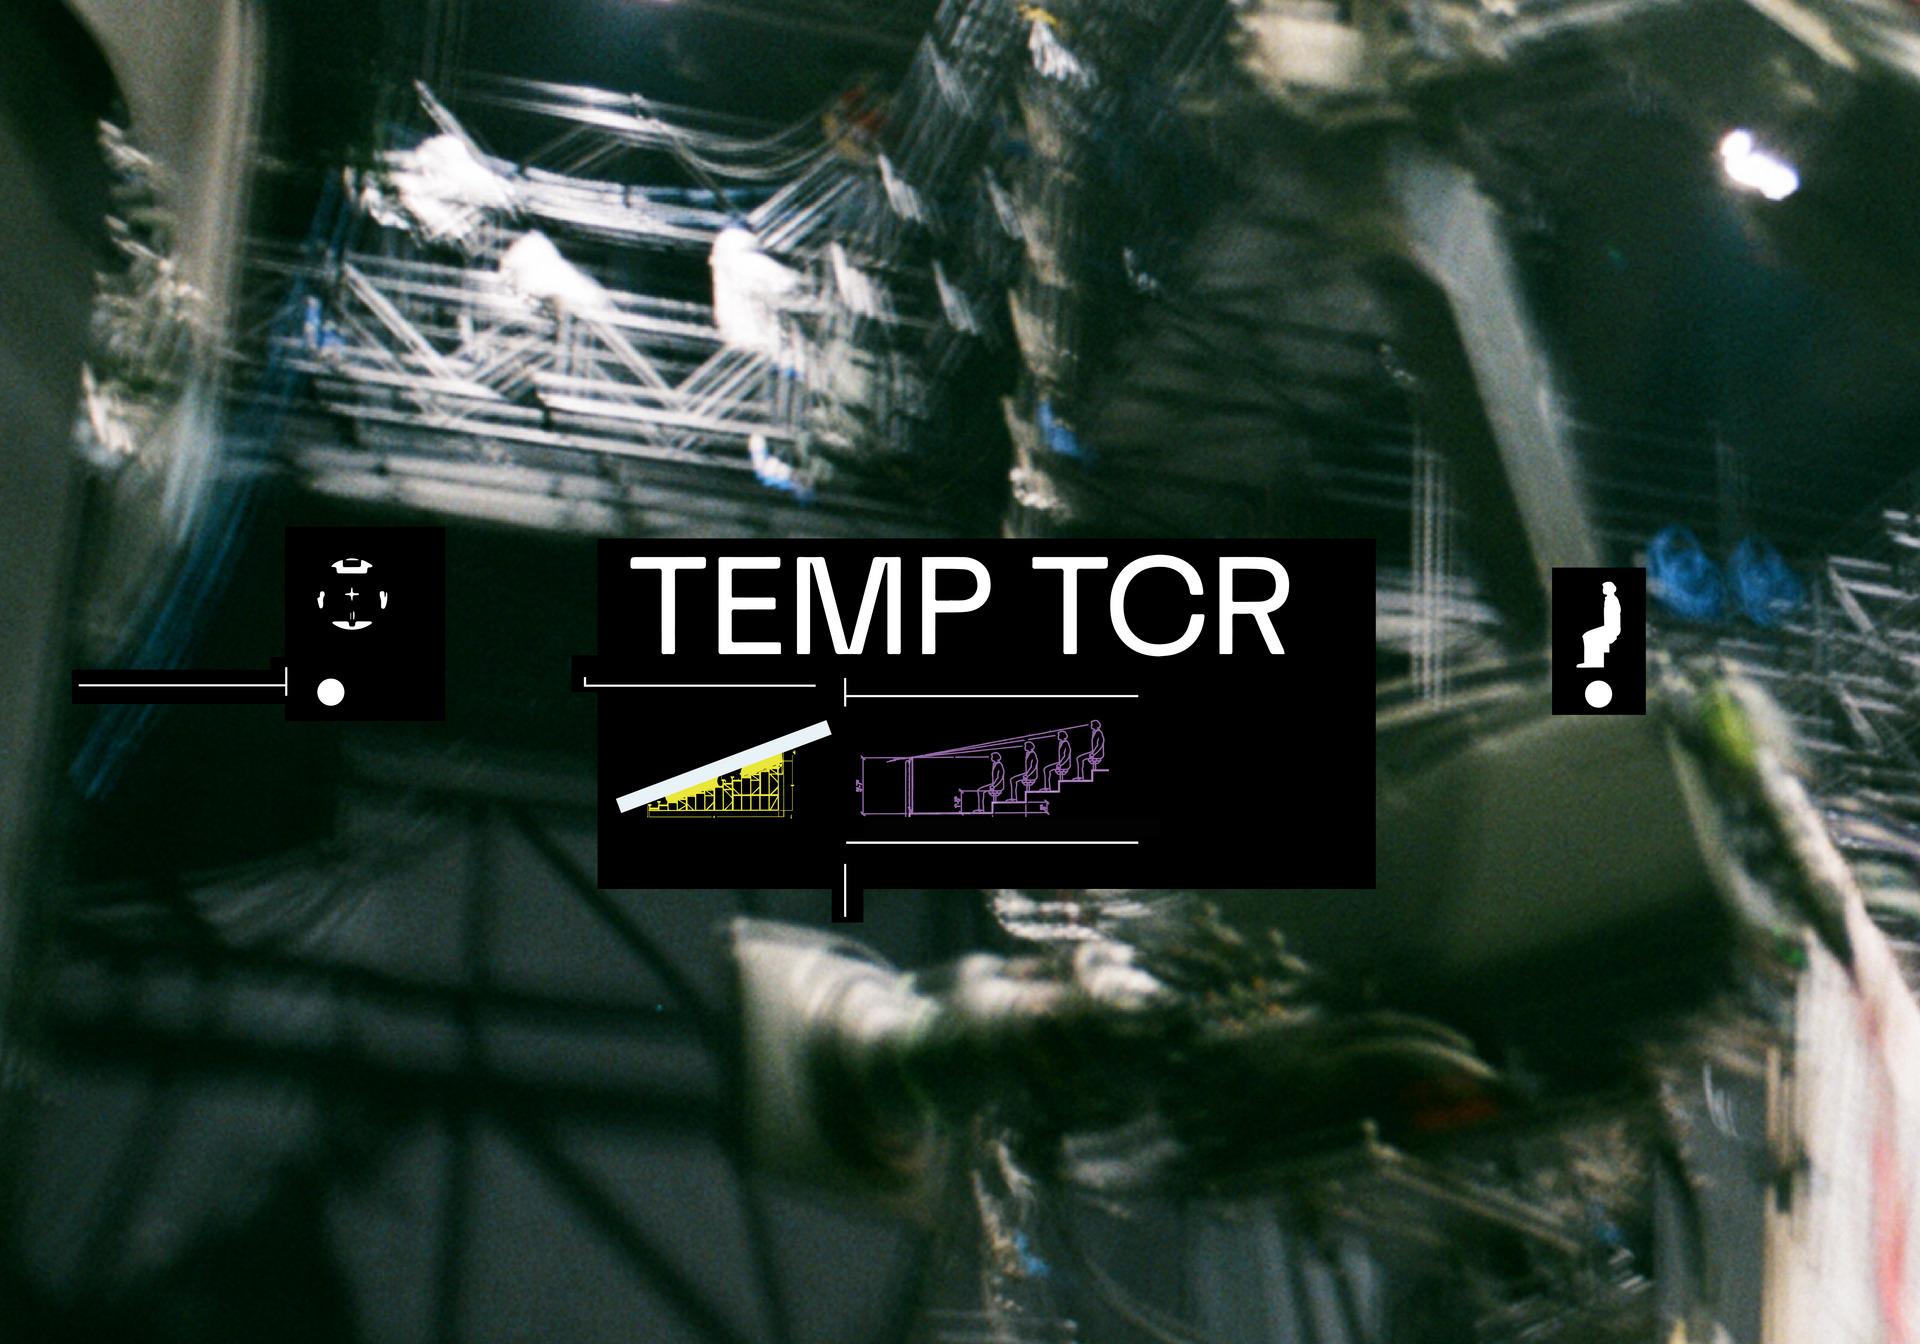 TEMP TCR Visual Identity